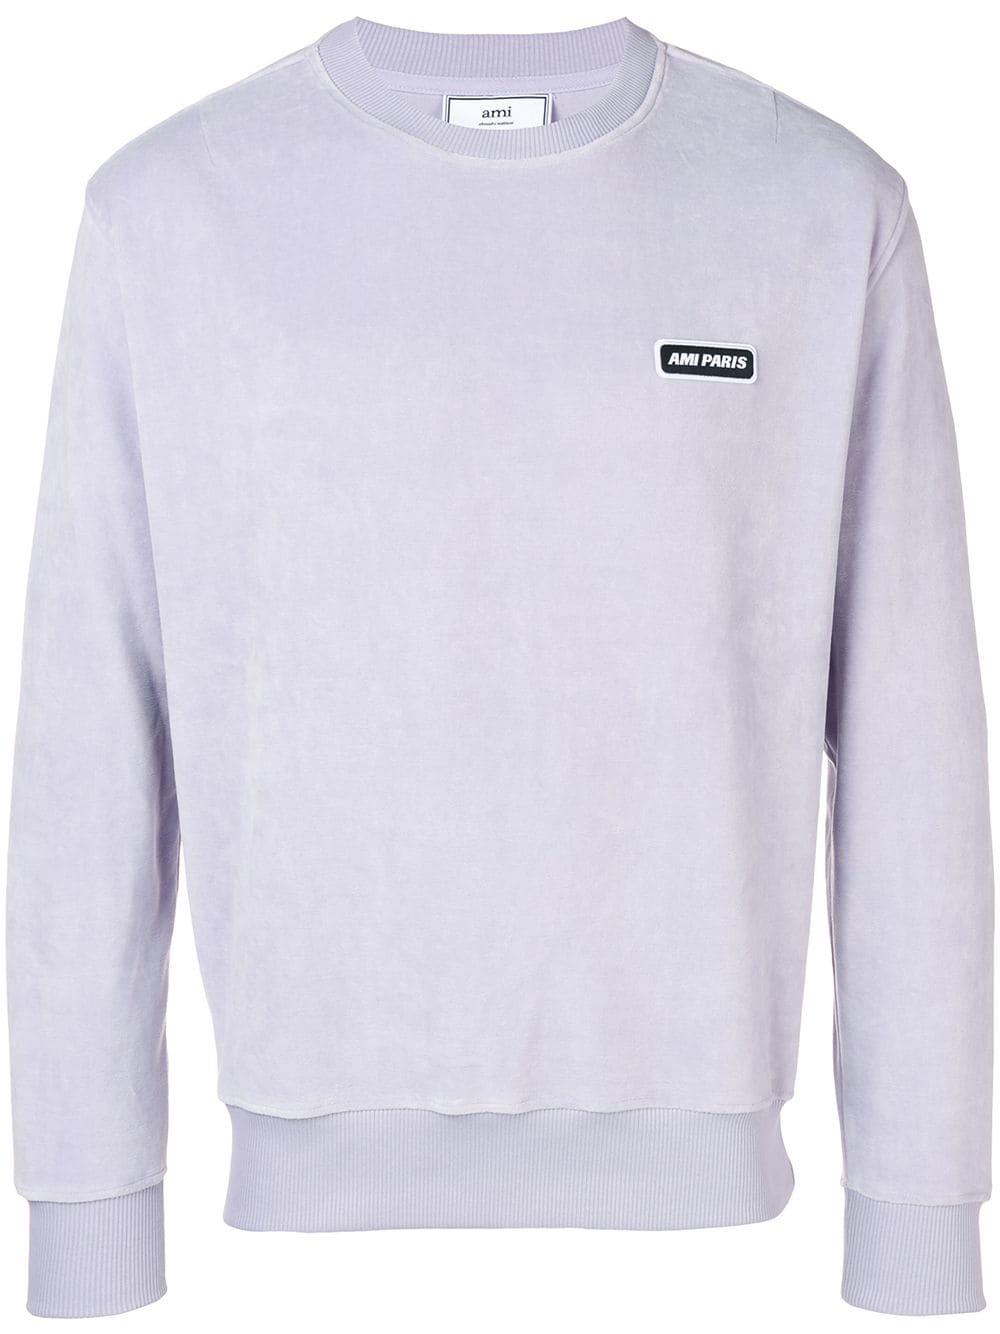 b5ec0f6037b Ami Alexandre Mattiussi Velvet Ami Patch Sweatshirt - Purple